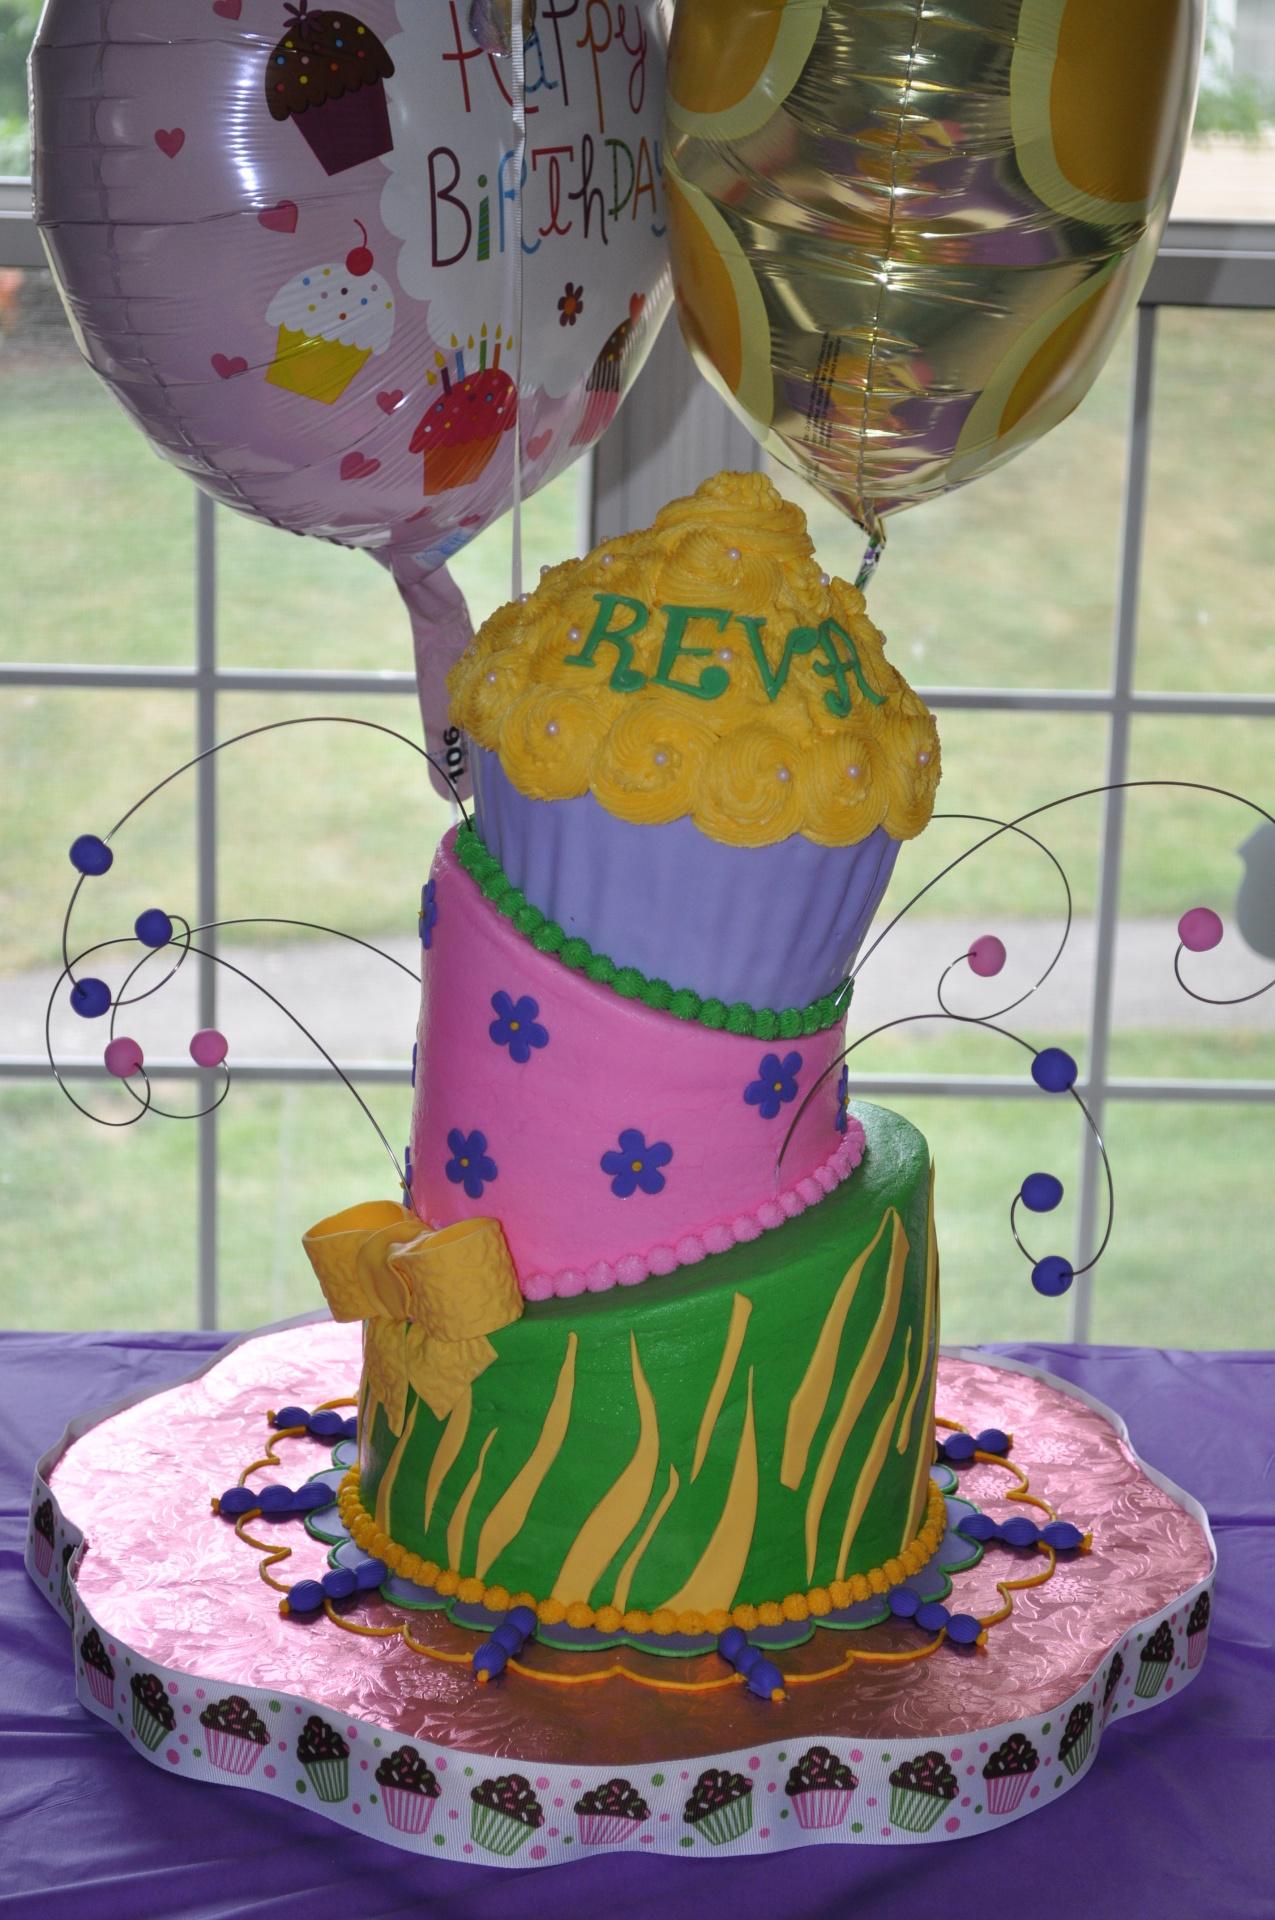 Topsy turvy cake, whimsical cake, giant /jumbo cupcake